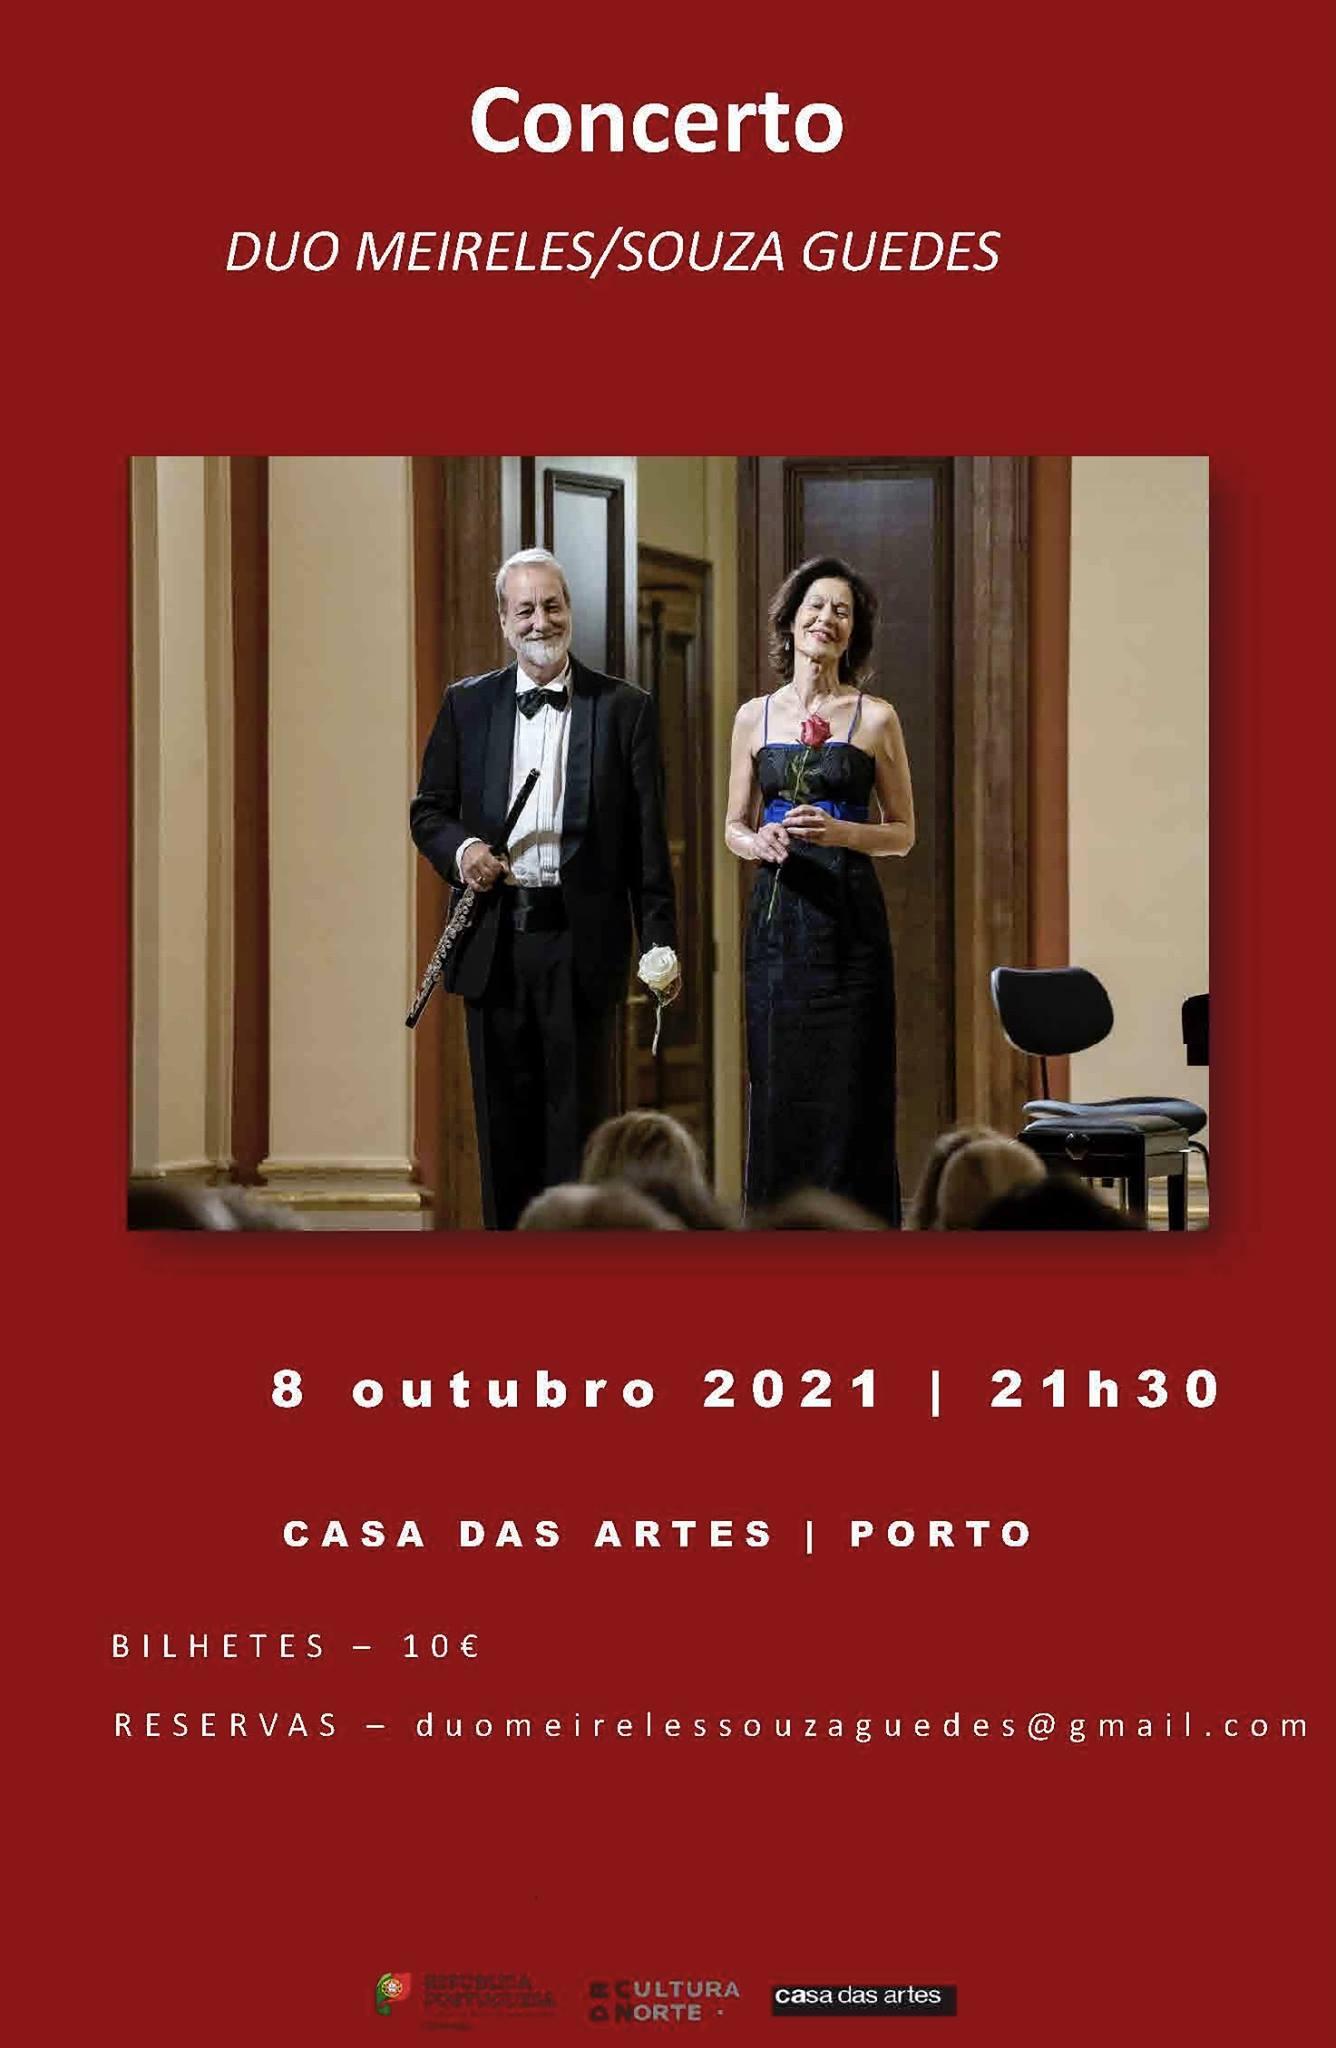 Concerto - Duo Meireles/Souza Guedes